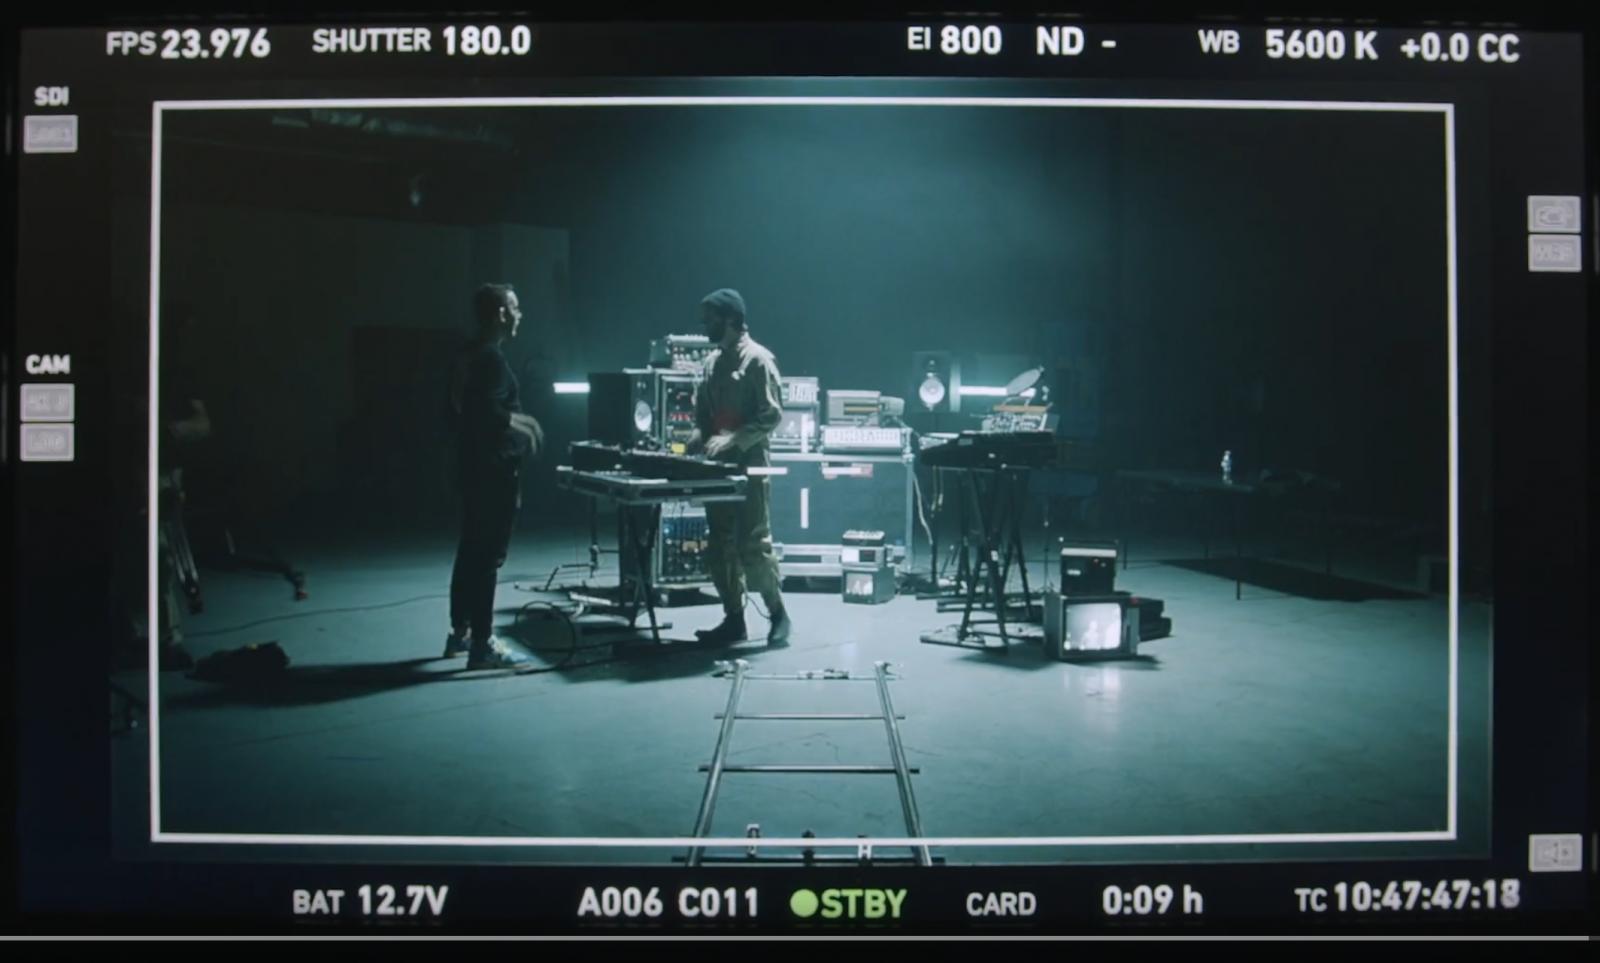 monitor-viewfinder-1-png.51882